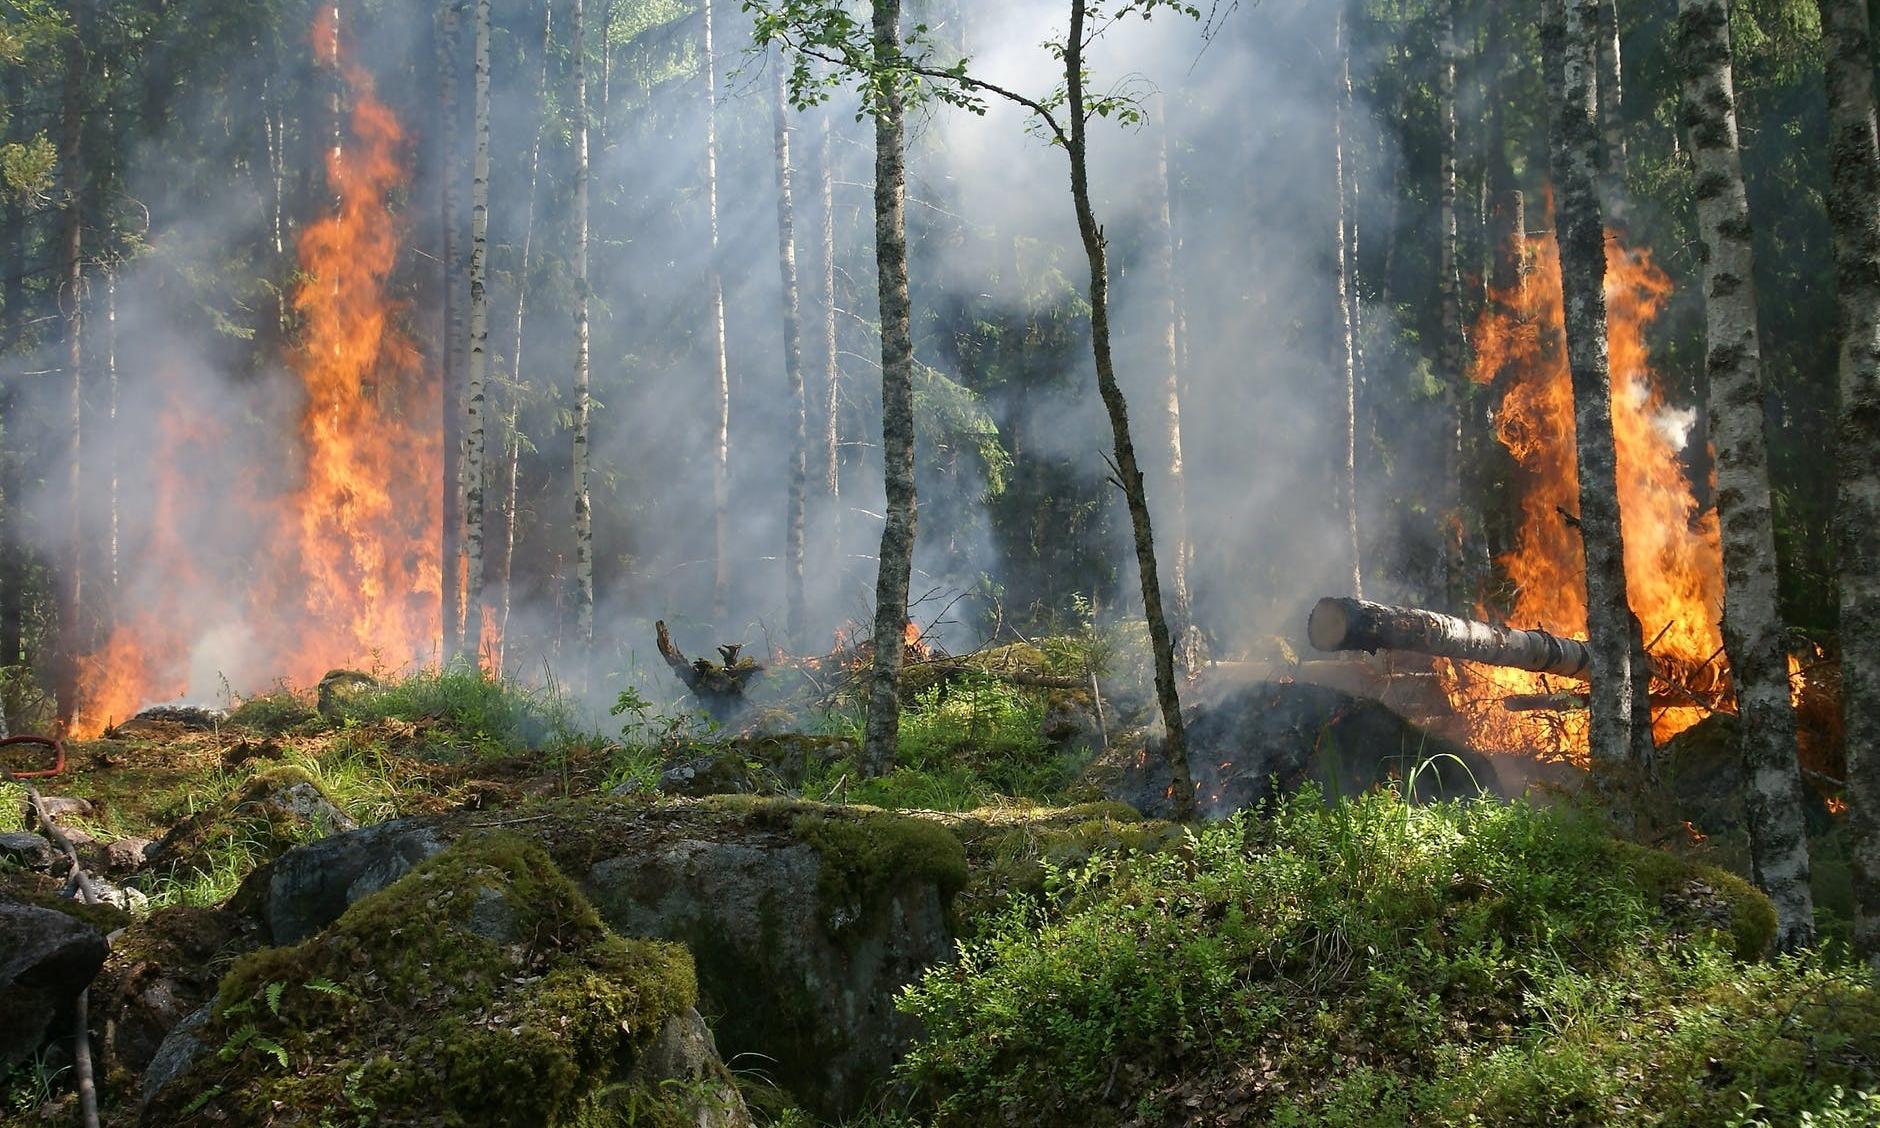 LVMH 将斥资 500 万欧元保护亚马逊雨林生态系统